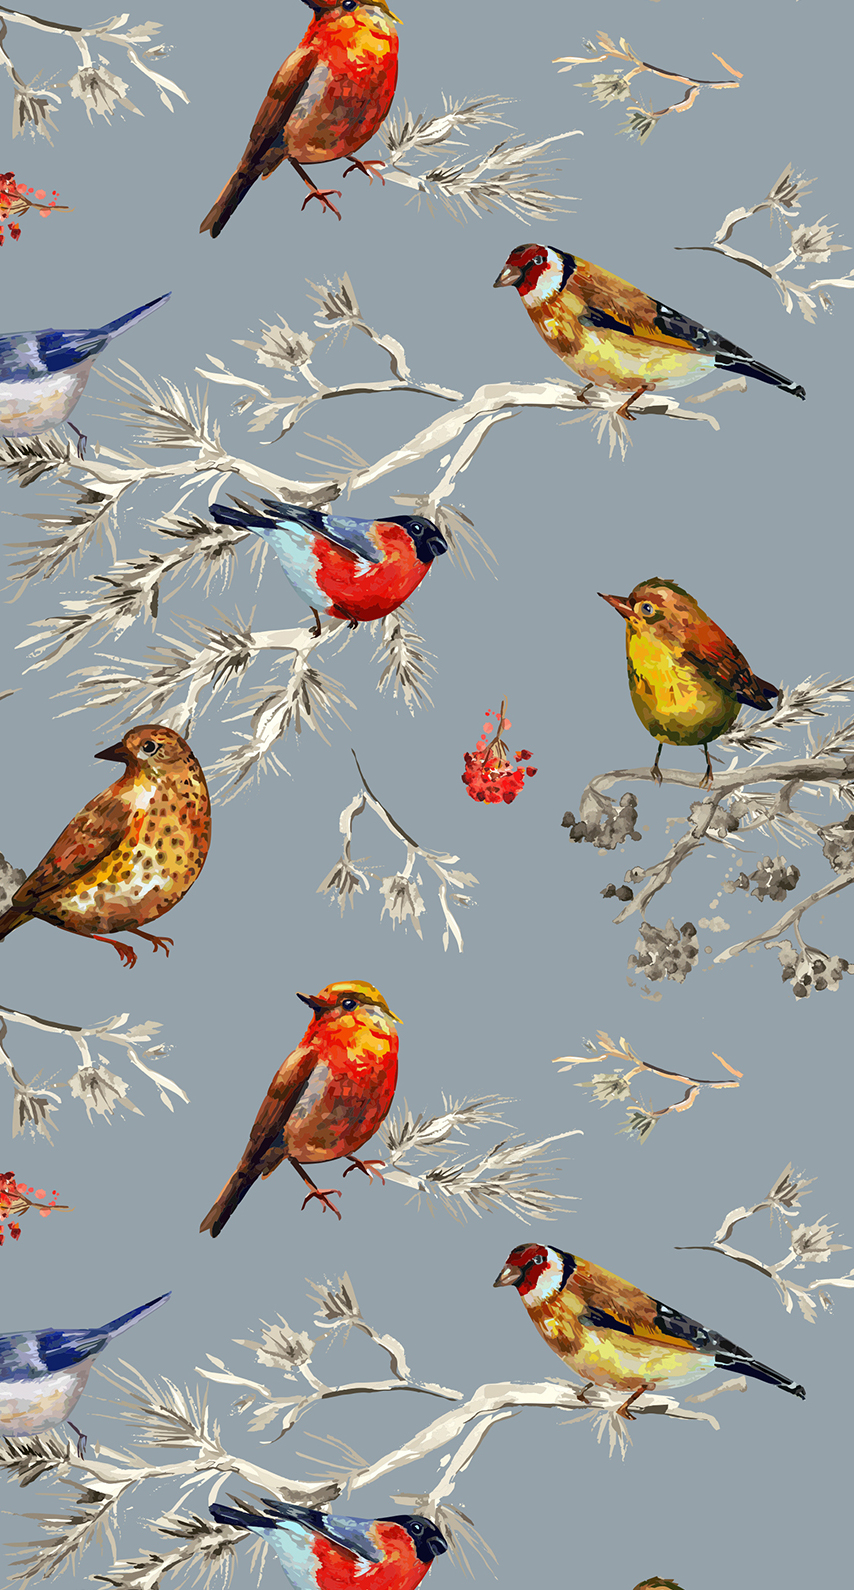 color, outdoors, flora, season, wildlife